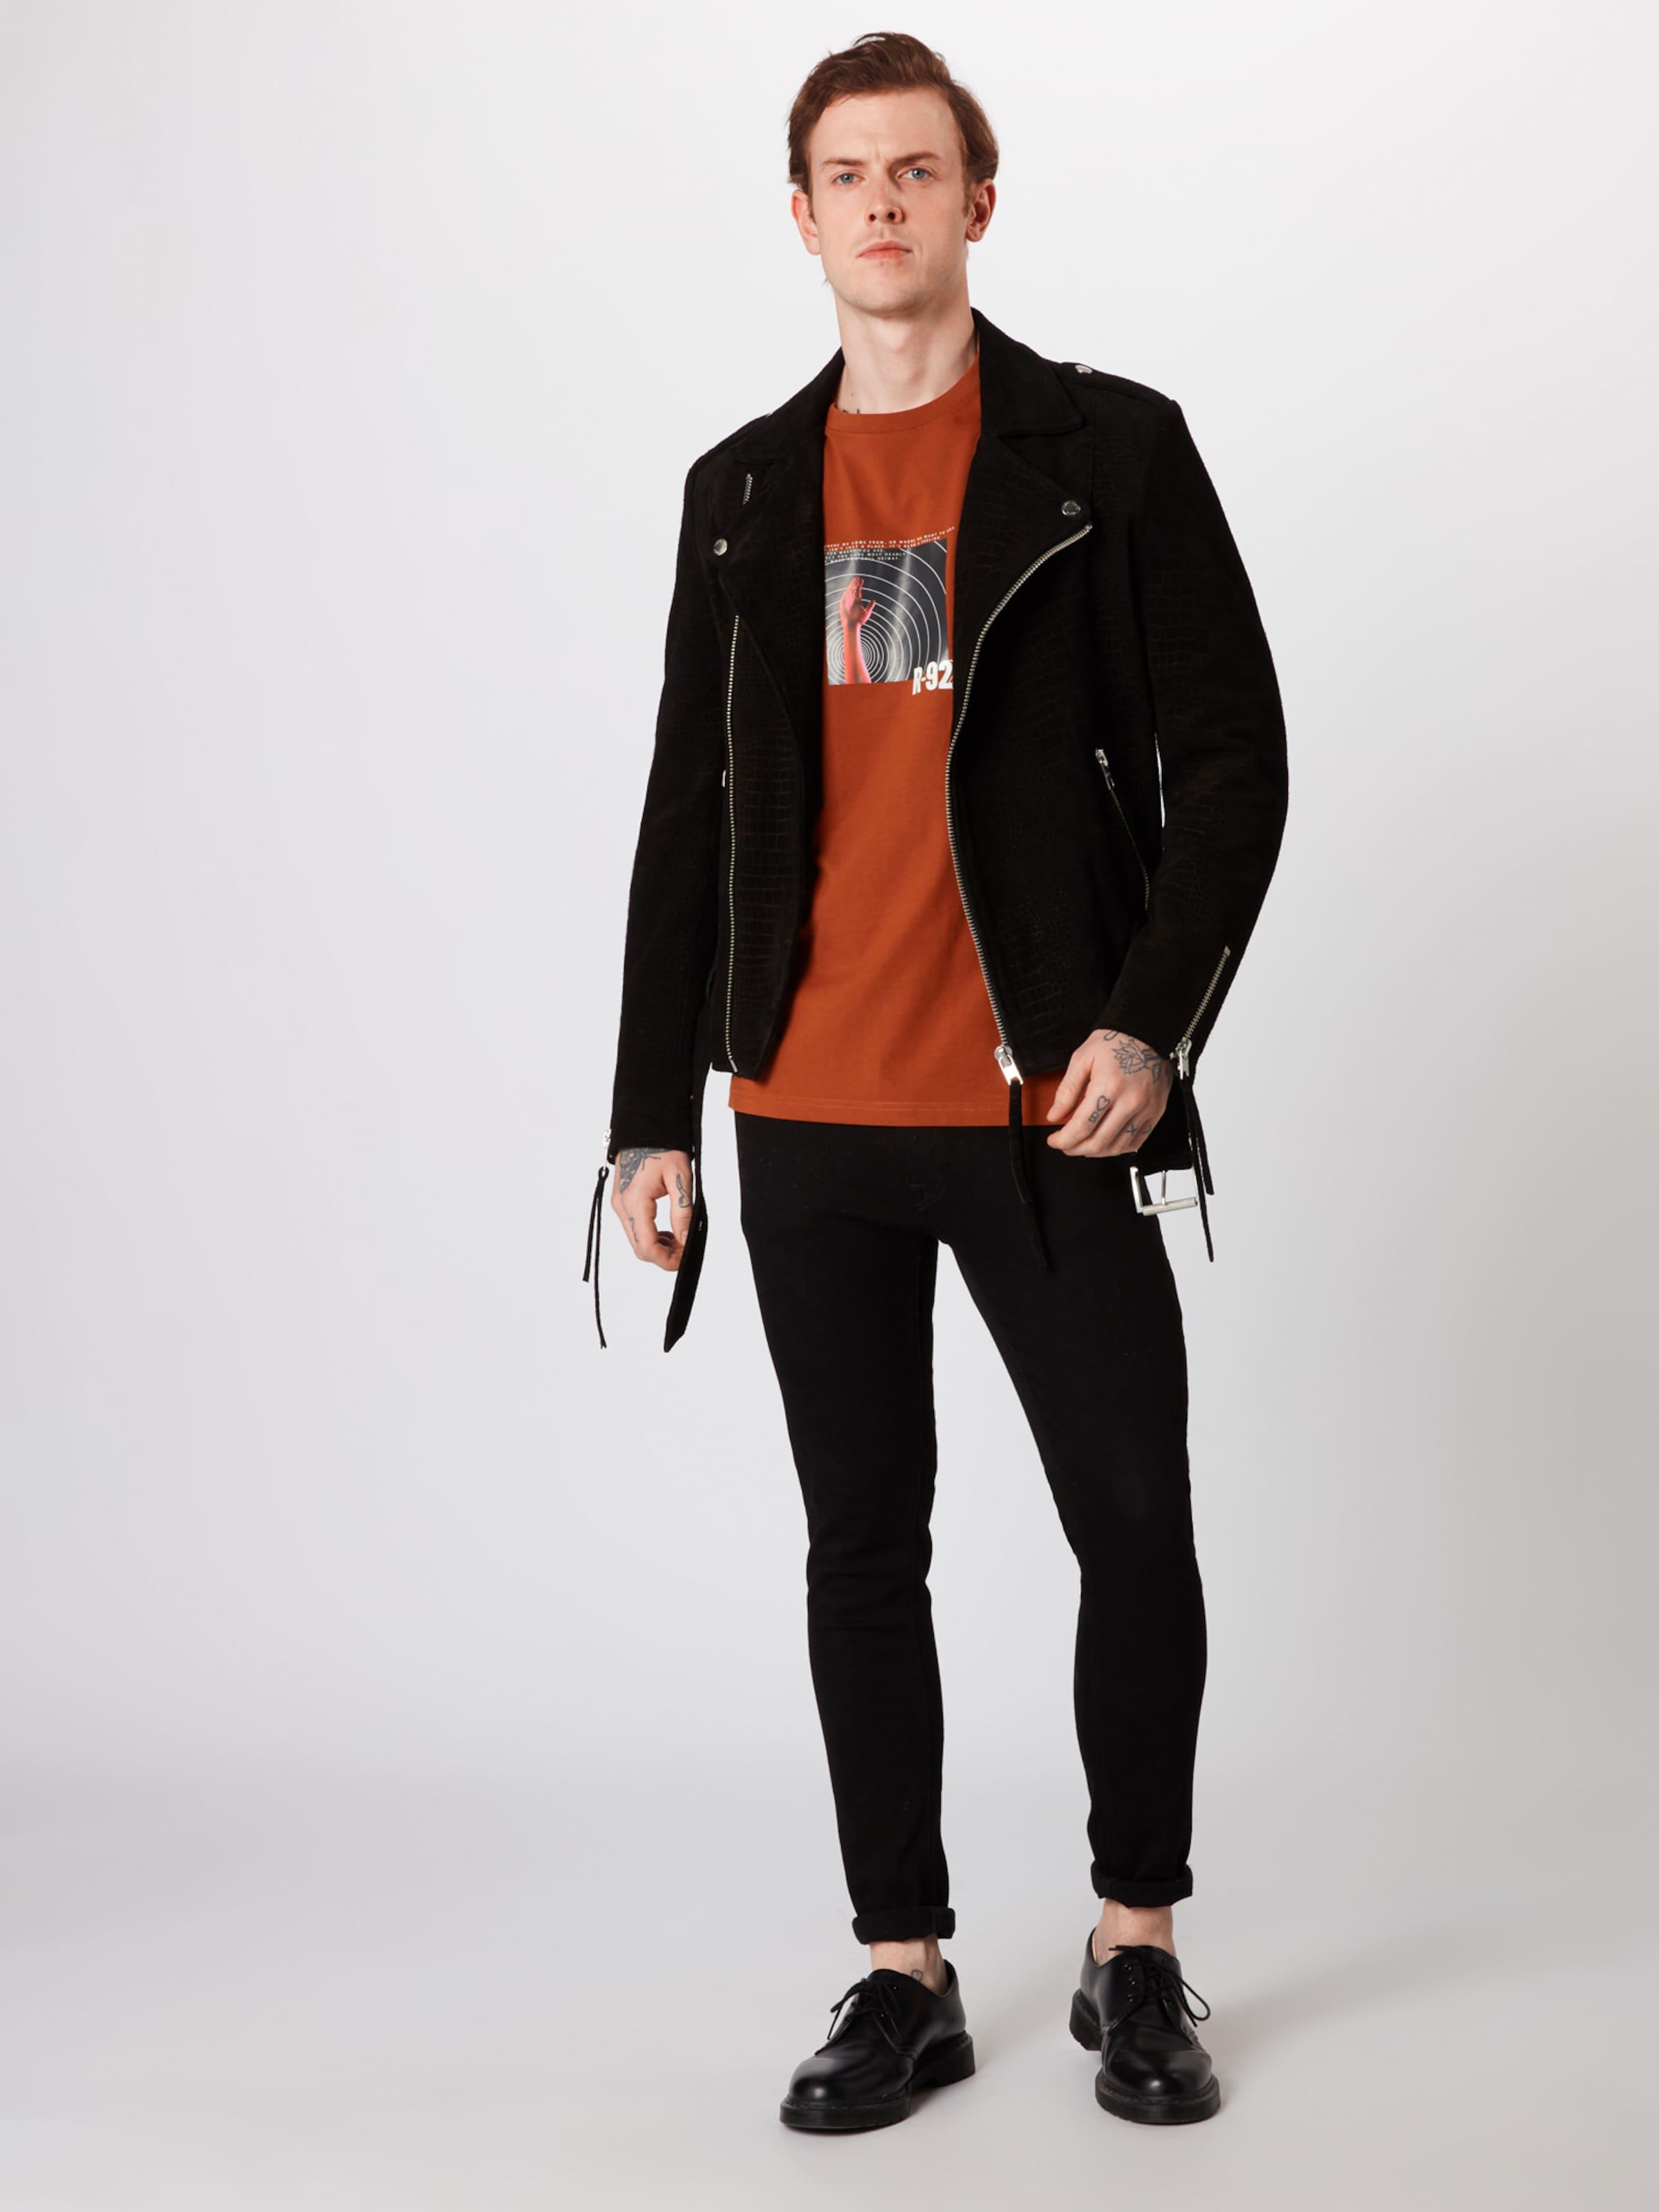 T Review shirt Band En 'cn Foncé Tee' Orange trhdQsC